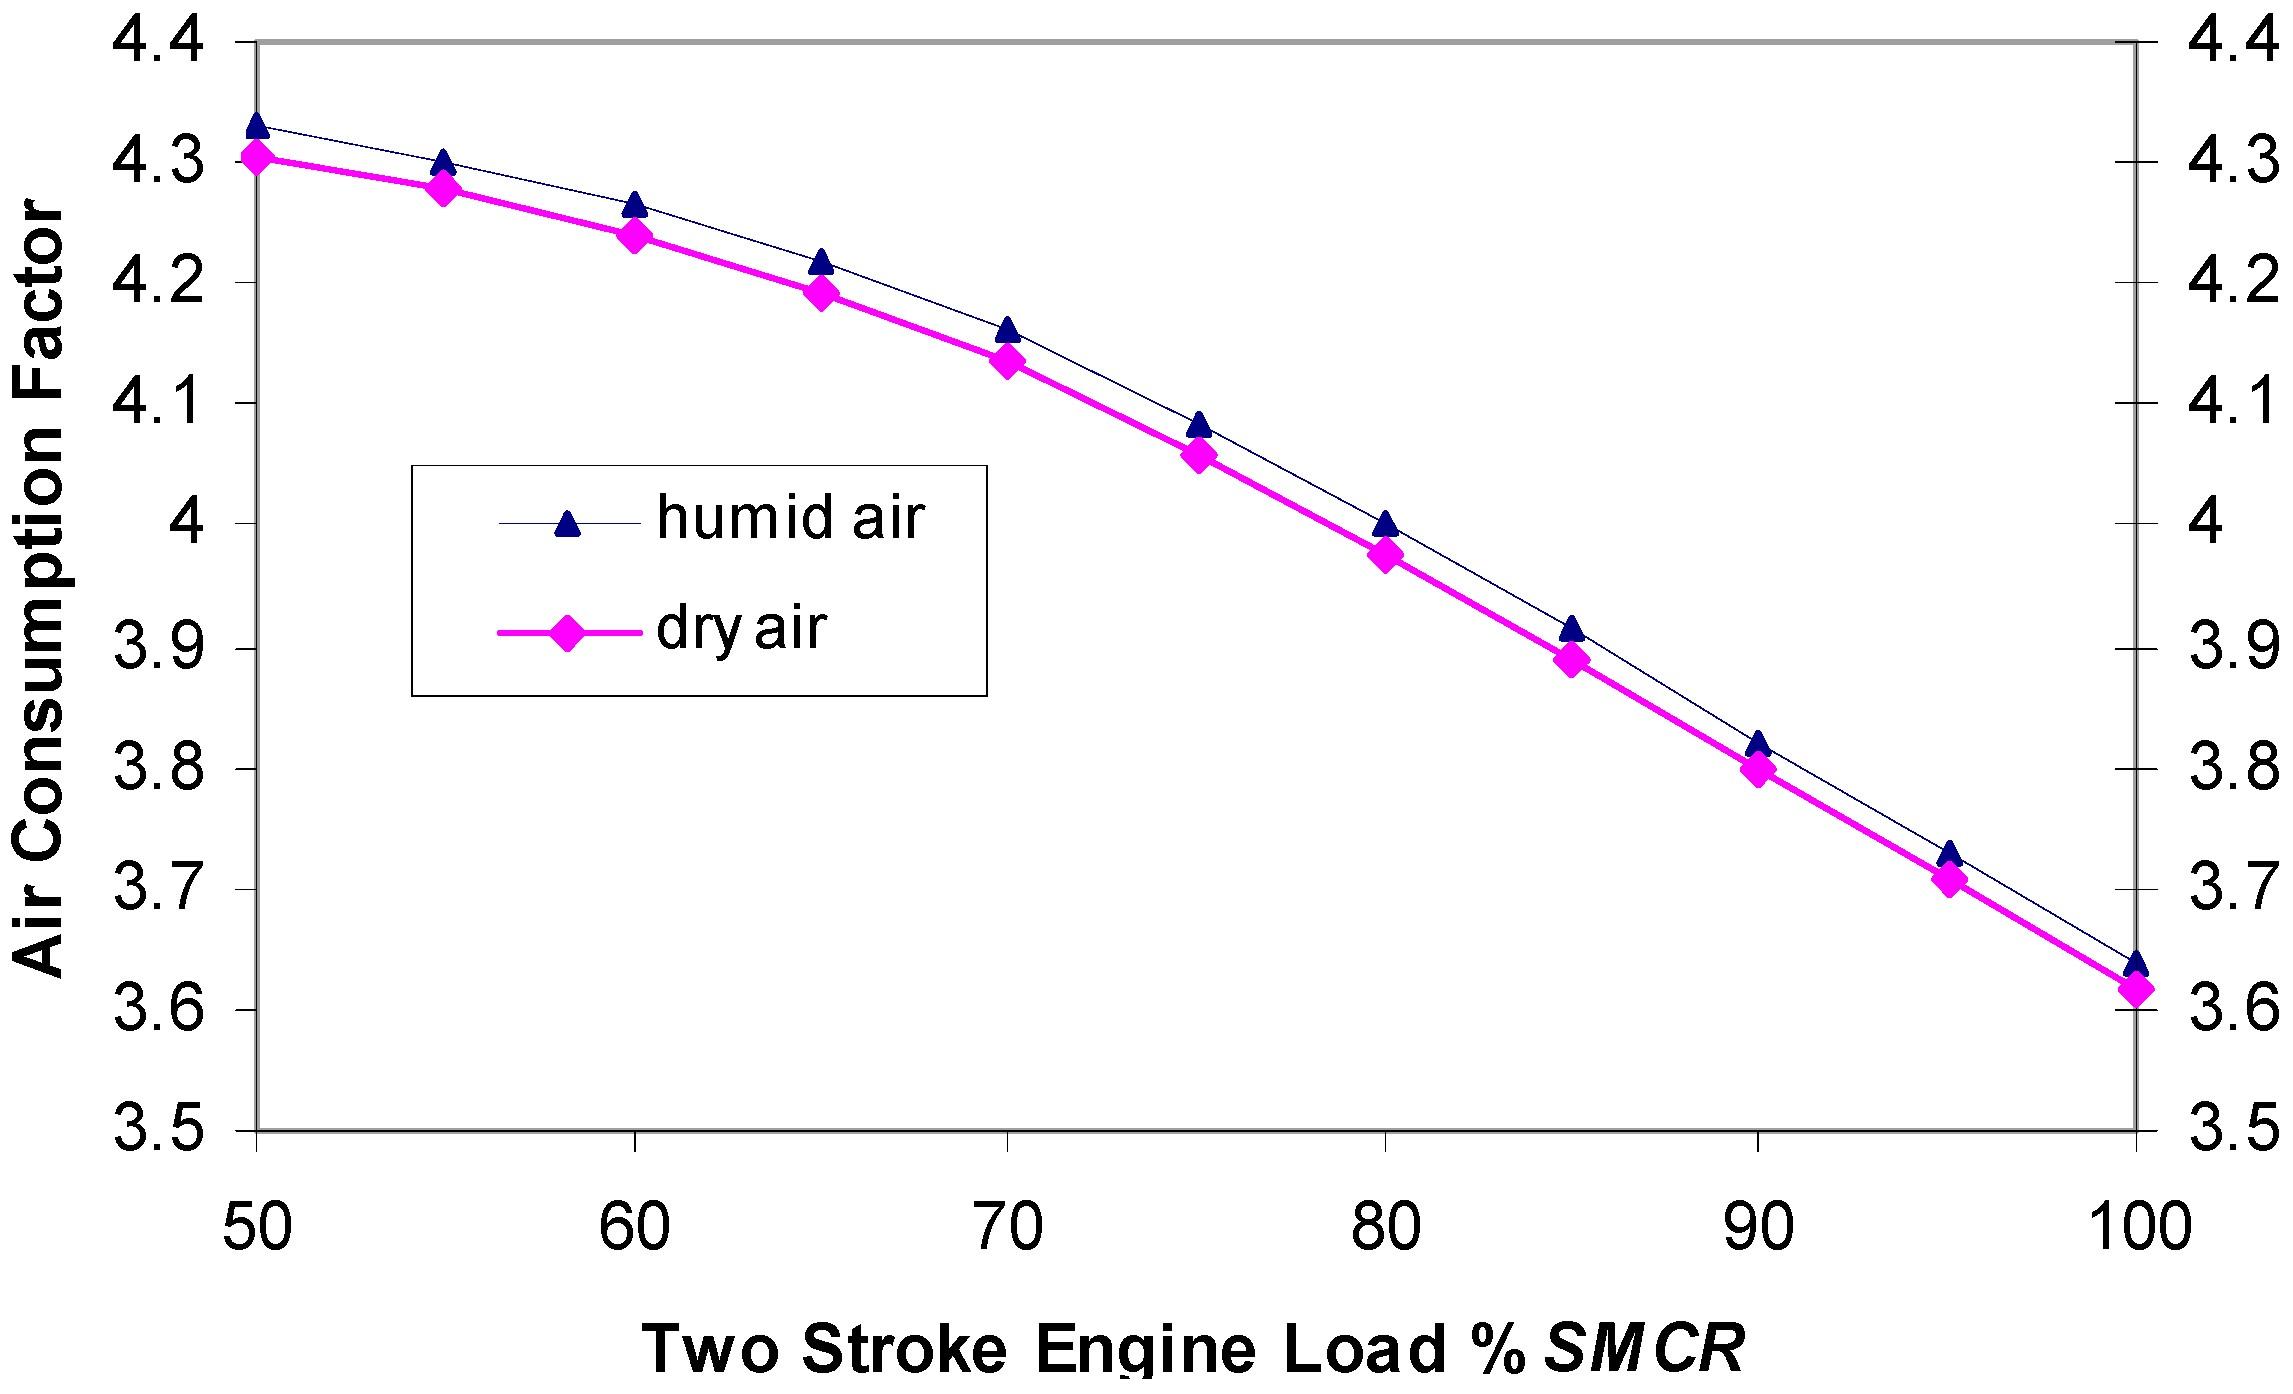 Four Stroke Engine Cycle Diagram Energies Free Full Text Of Four Stroke Engine Cycle Diagram